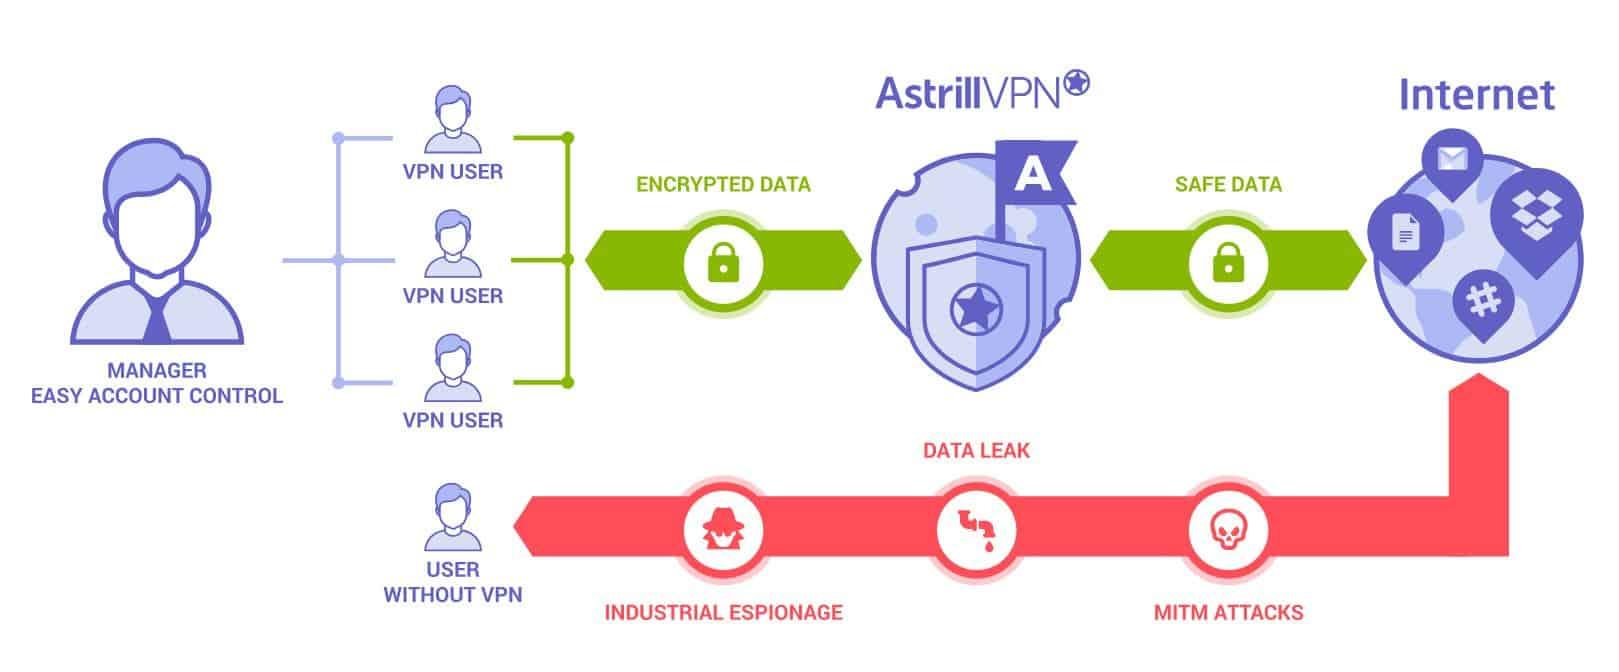 Astrill VPN: Leading in Virtual Private Network Services